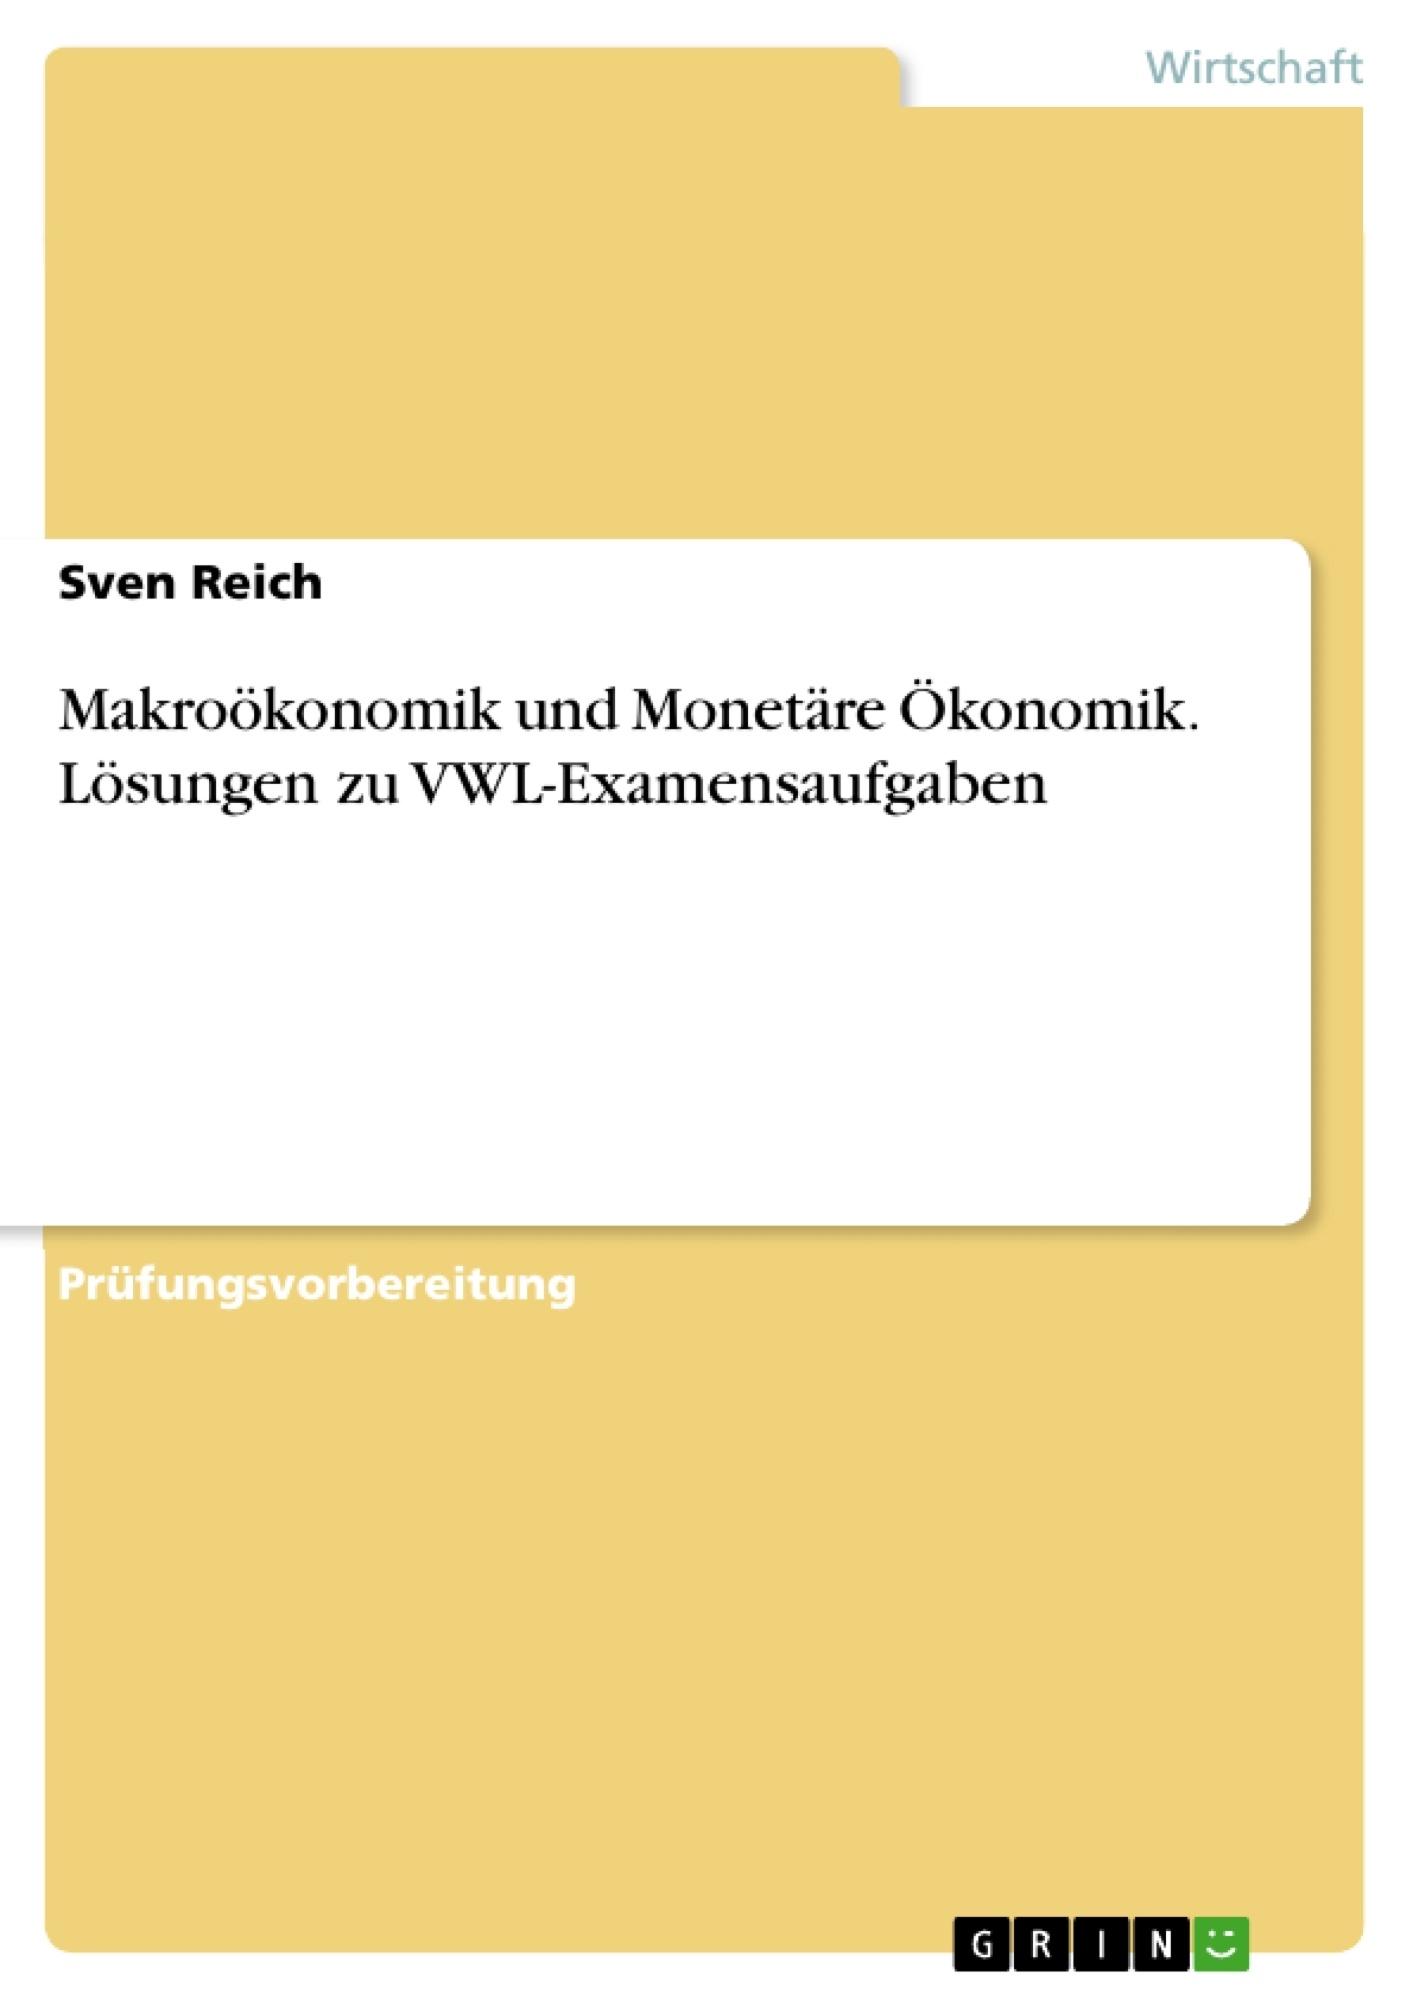 Titel: Makroökonomik und Monetäre Ökonomik. Lösungen zu VWL-Examensaufgaben